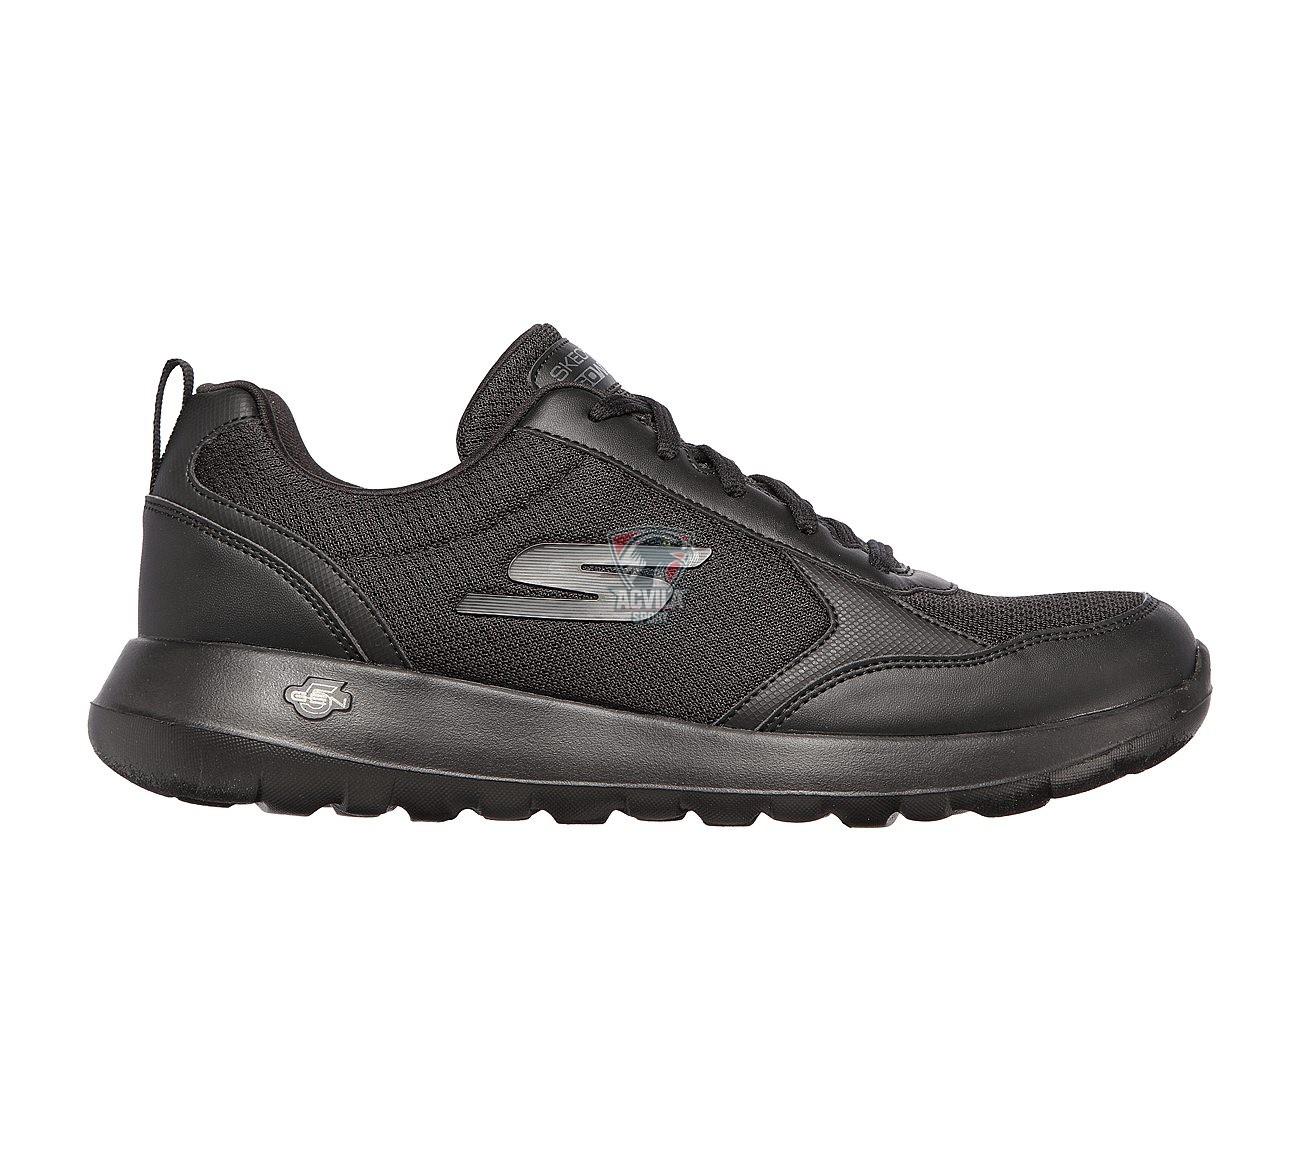 photo 4 Мужская обувь SKECHERS DELSON - ANTIGO